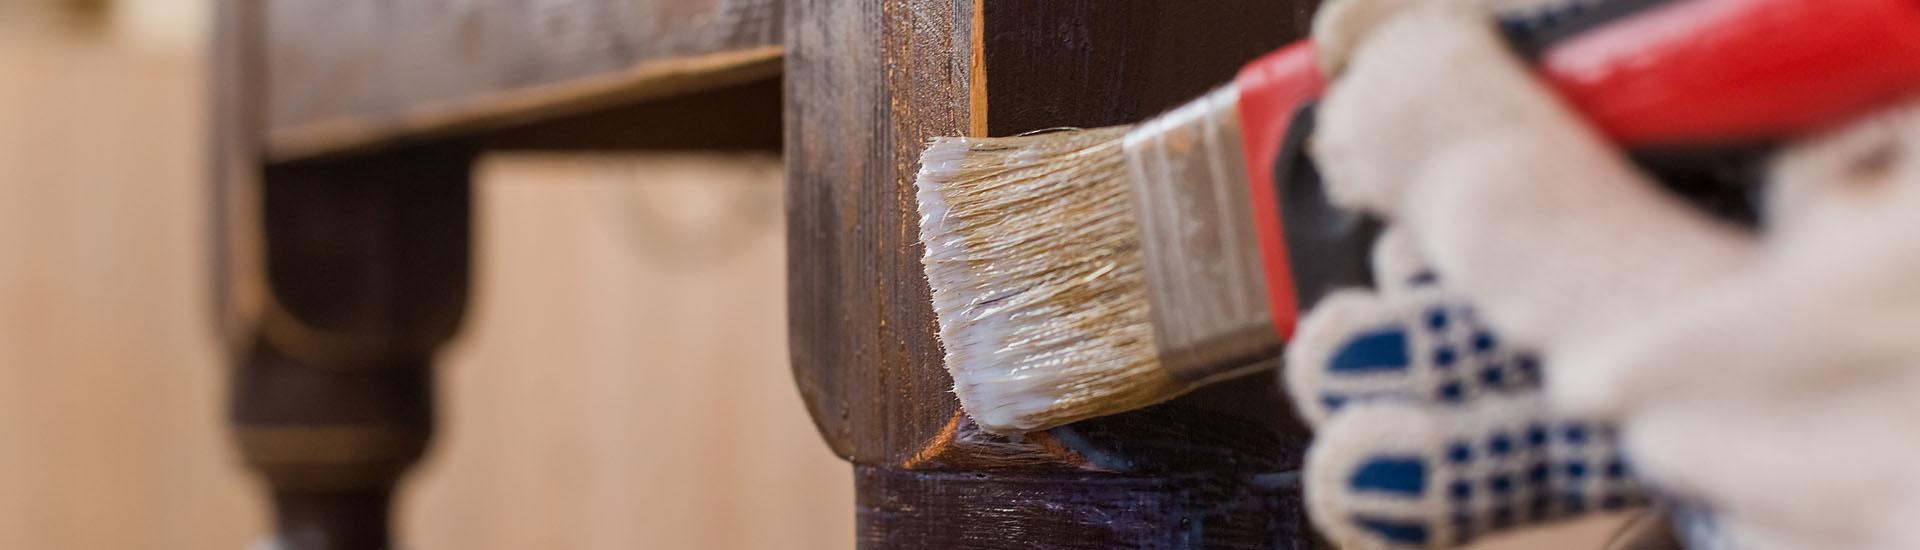 Restaurare Tavolo Legno Rovinato restauro mobili bergamo | falegnameria cortinovis - bergamo